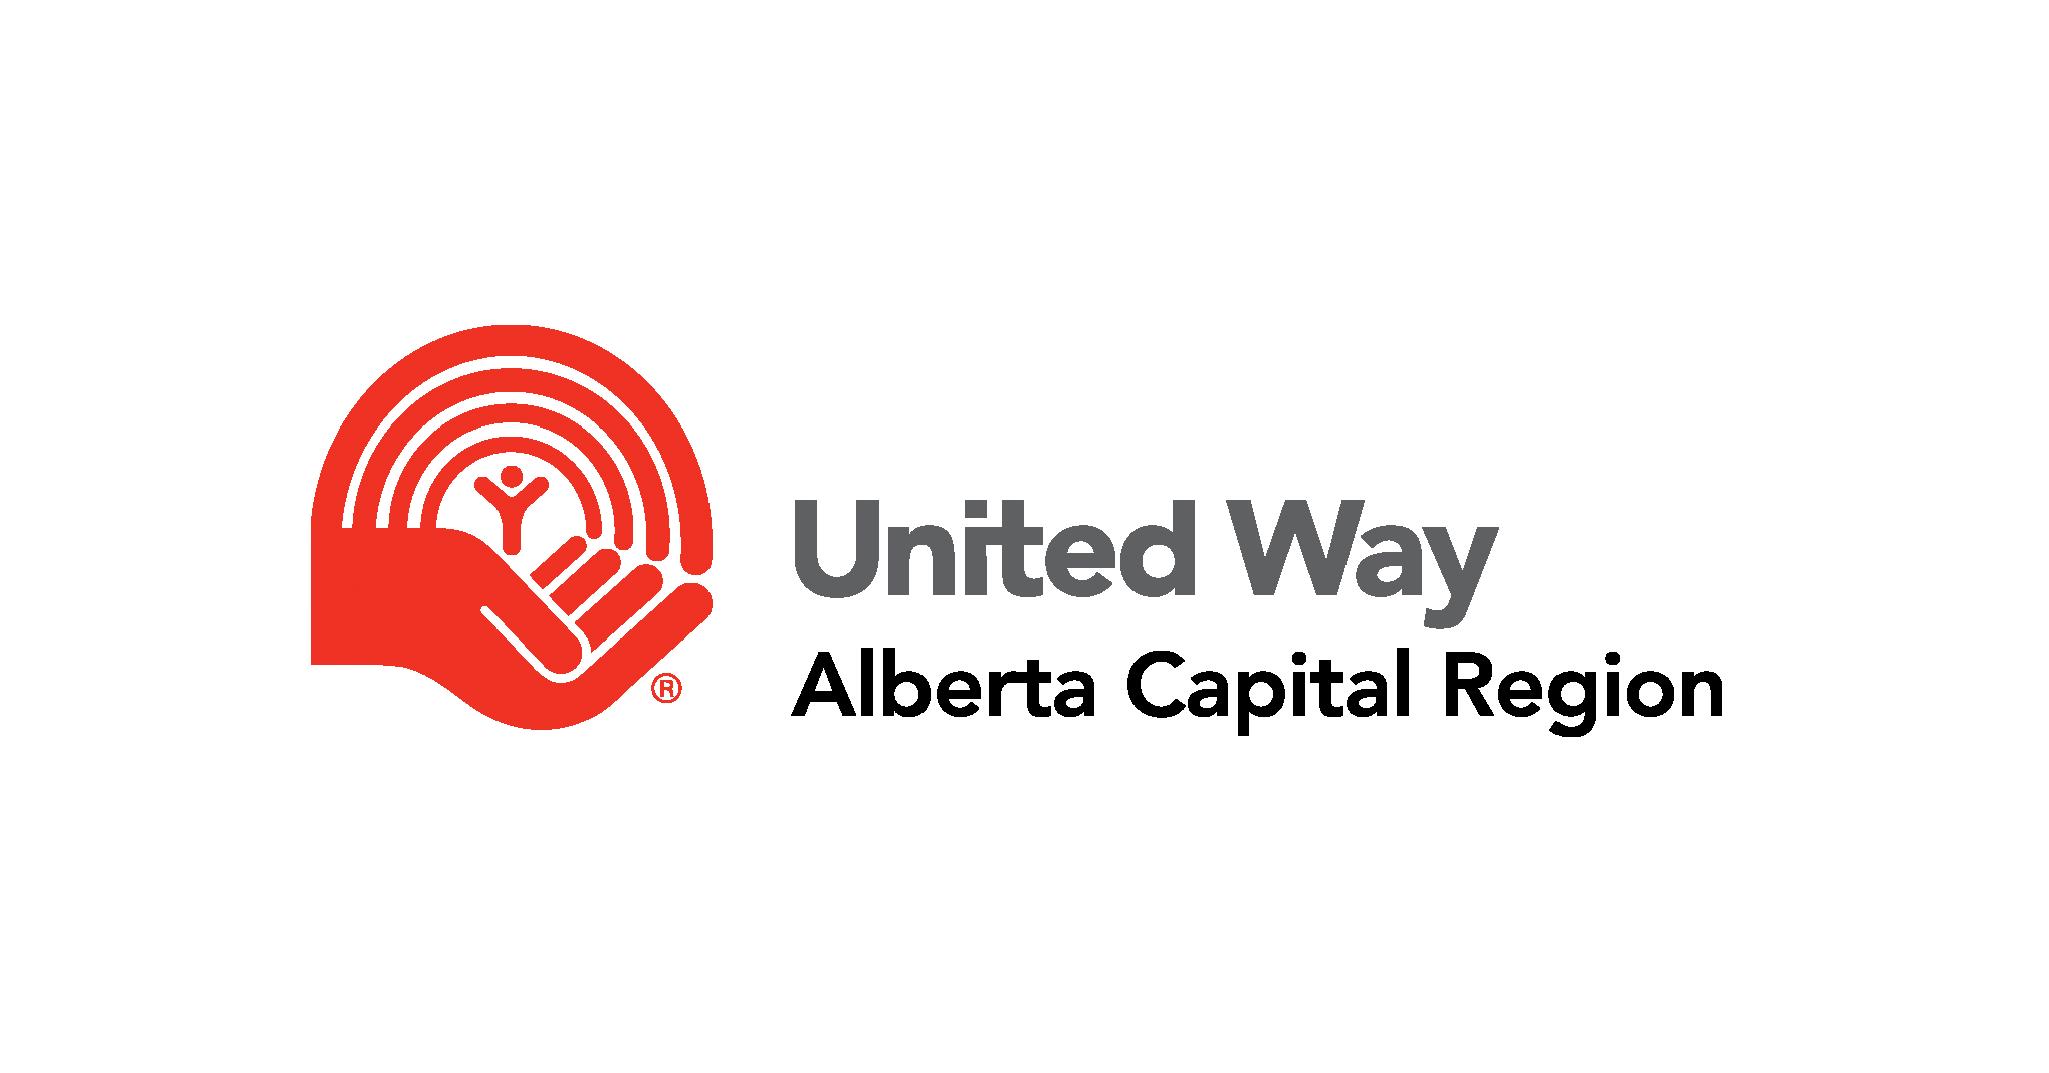 UnitedWay_April